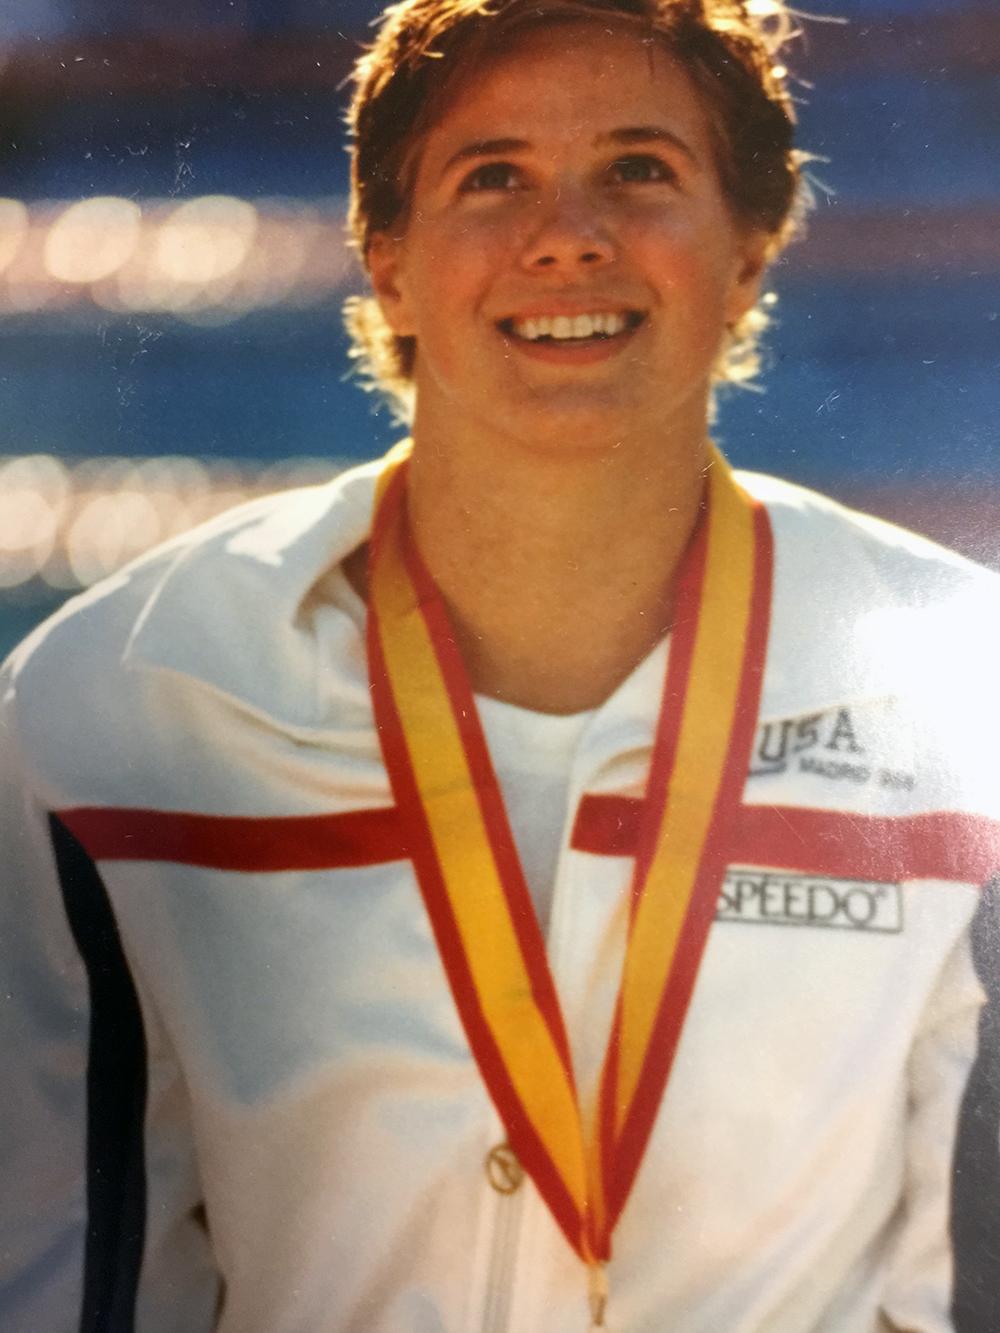 1986 World Championship win, in Madrid, Spain.